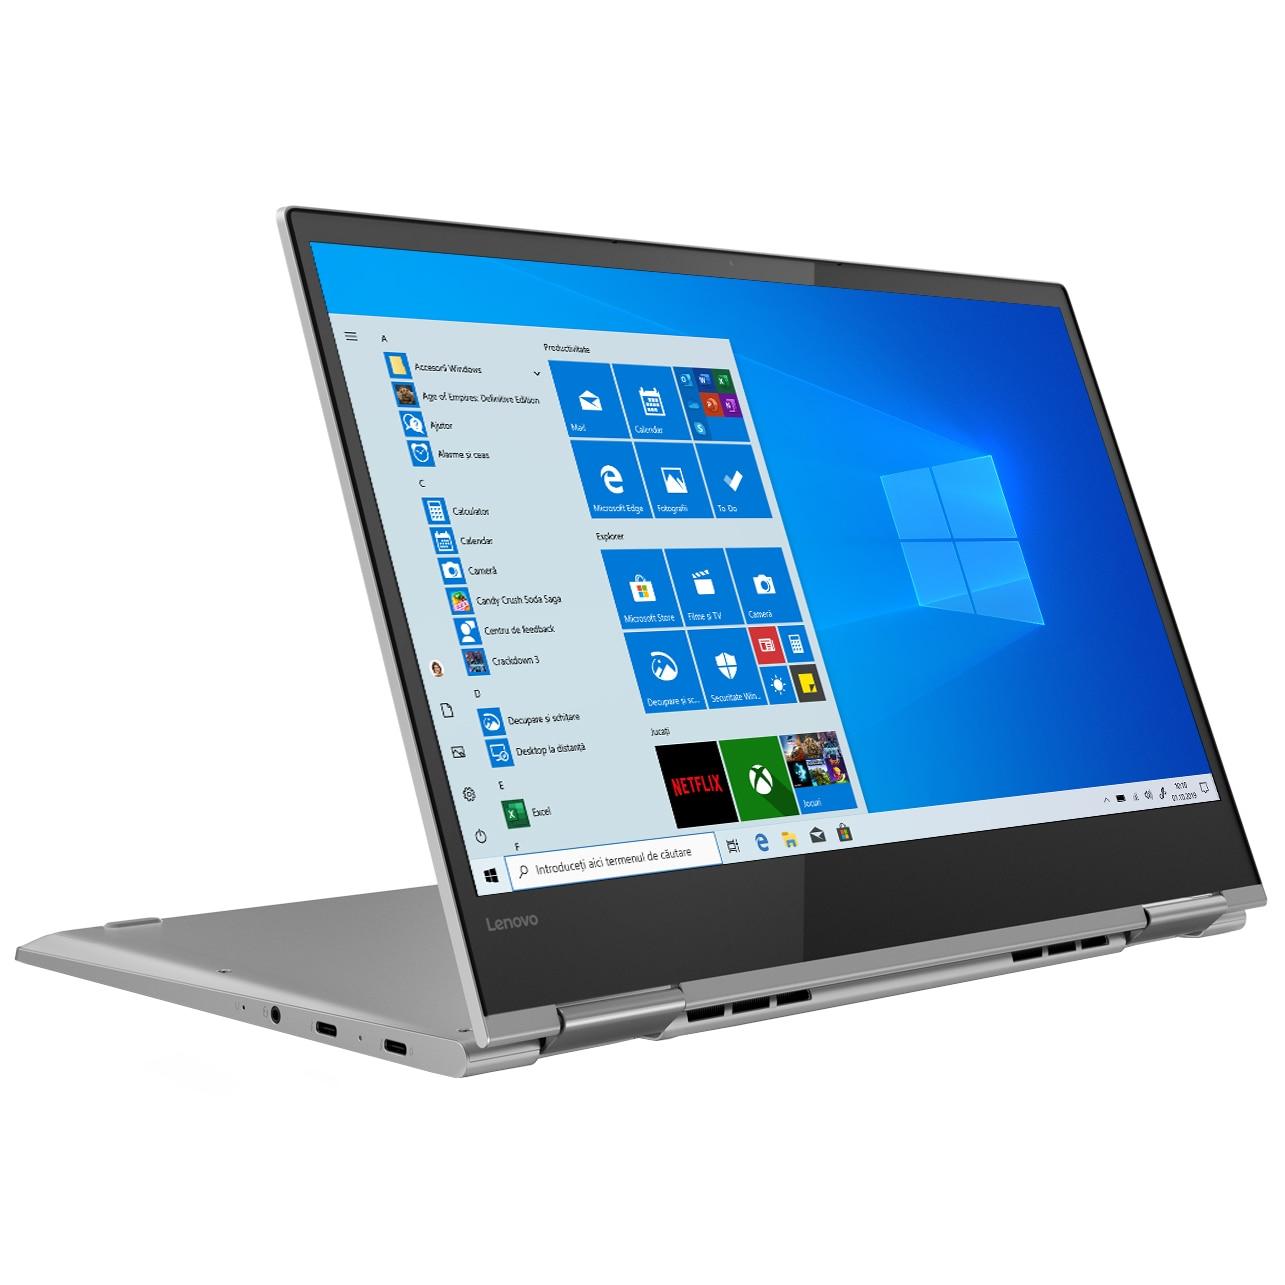 "Fotografie Laptop 2 in 1 Lenovo YOGA 730-13IKB cu procesor Intel® Core™ i7-8550U pana la 4.00 GHz, Kaby Lake R, 13.3"", UHD, IPS, Touch, 8GB, 512GB SSD, Intel® UHD Graphics 620, Microsoft Windows 10, Platinum, Bluetooth Active Pen"